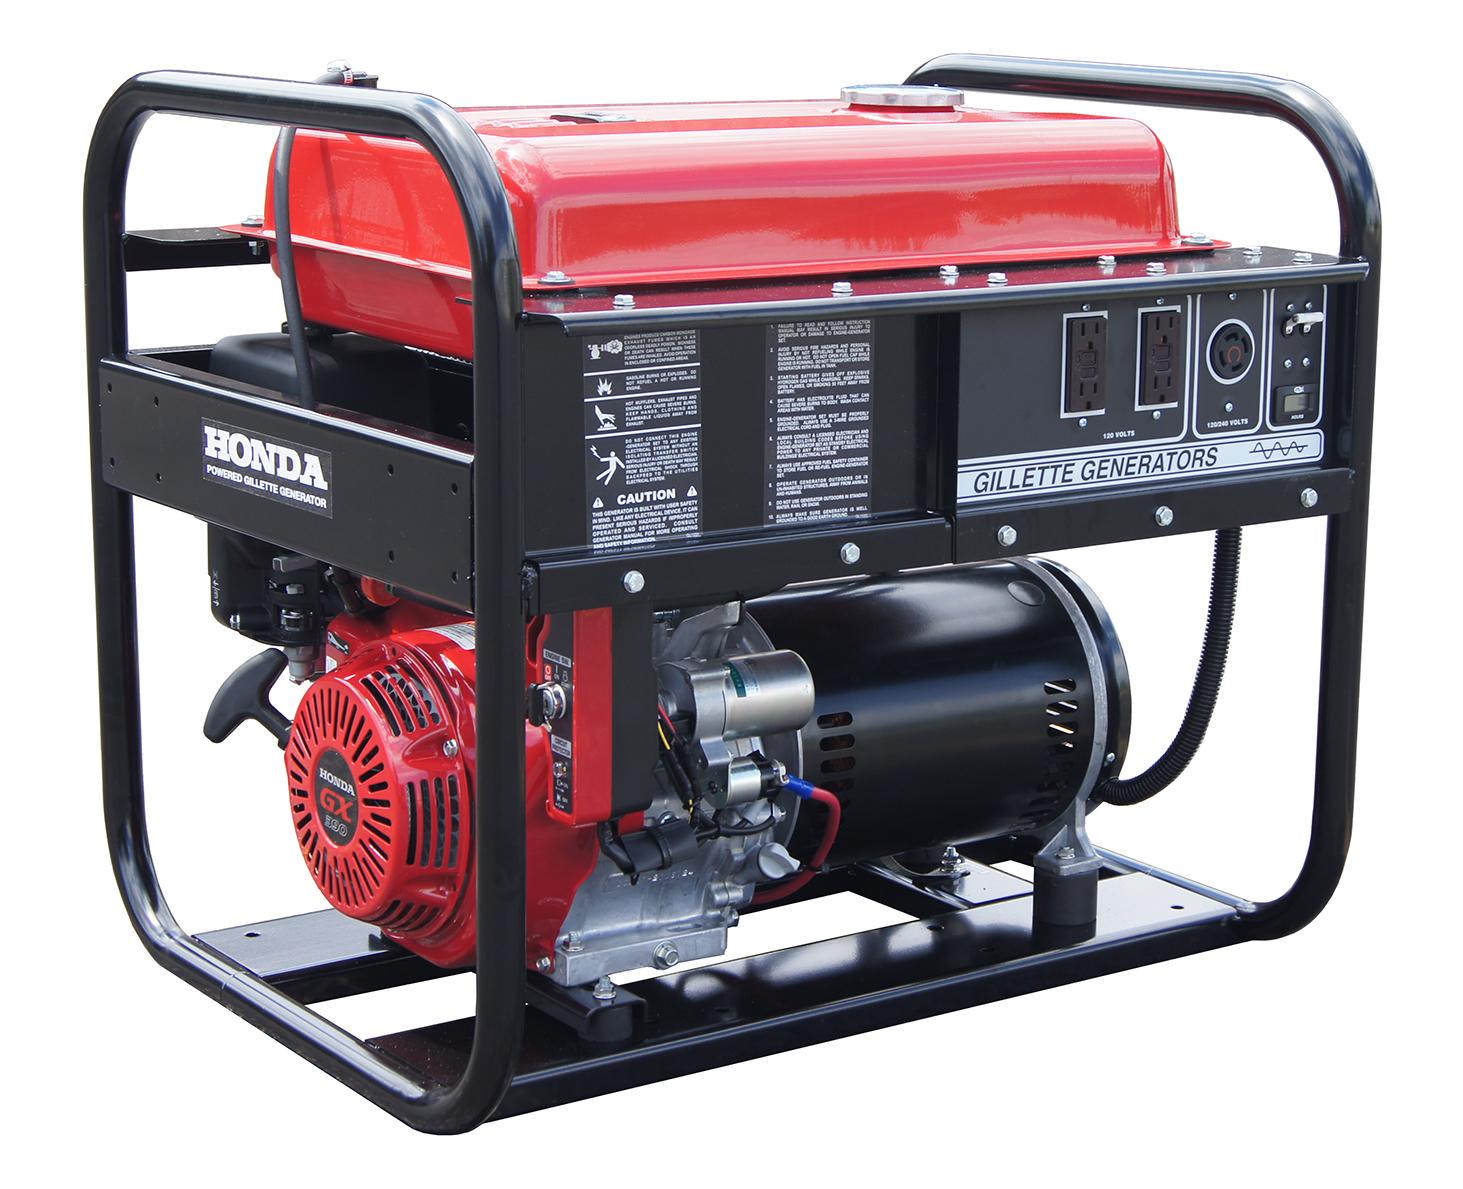 Gillette Portable Gasoline Generator - GPE-75EH, 6500 Watts, 13 HP, Honda